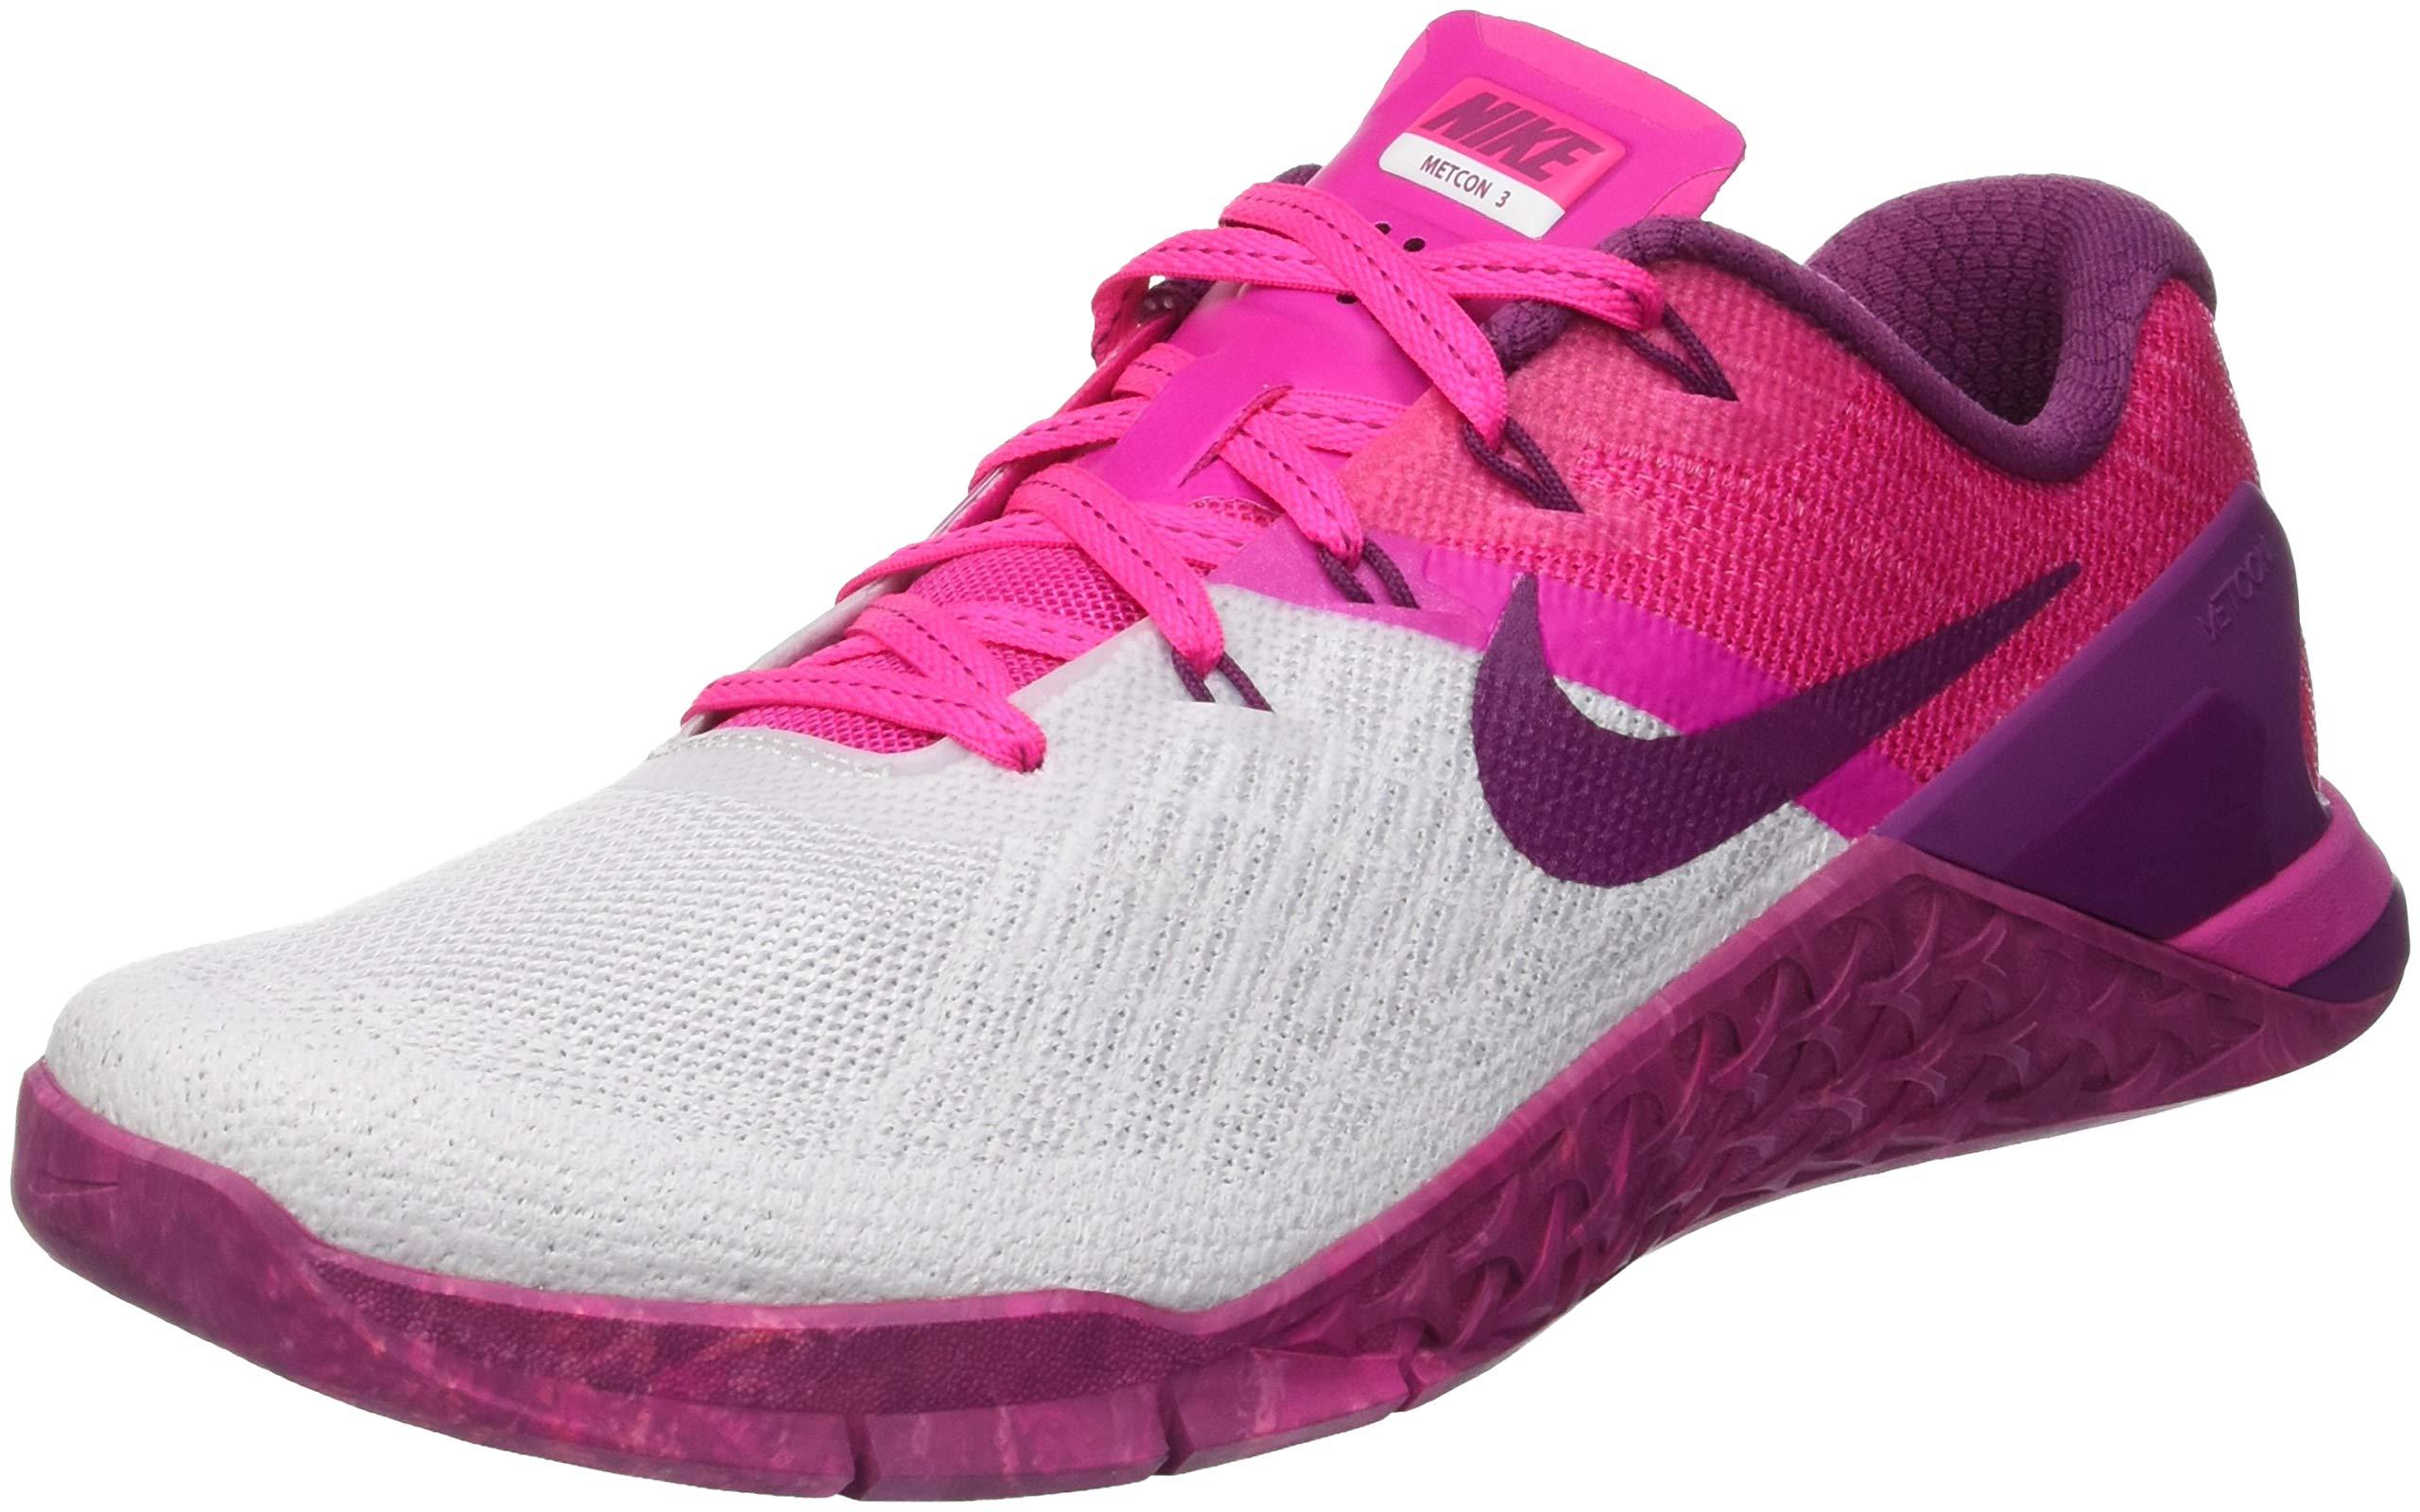 Galleon - Nike Women s Metcon 3 Training Shoe (8.5 B(M) US 7a012ec92